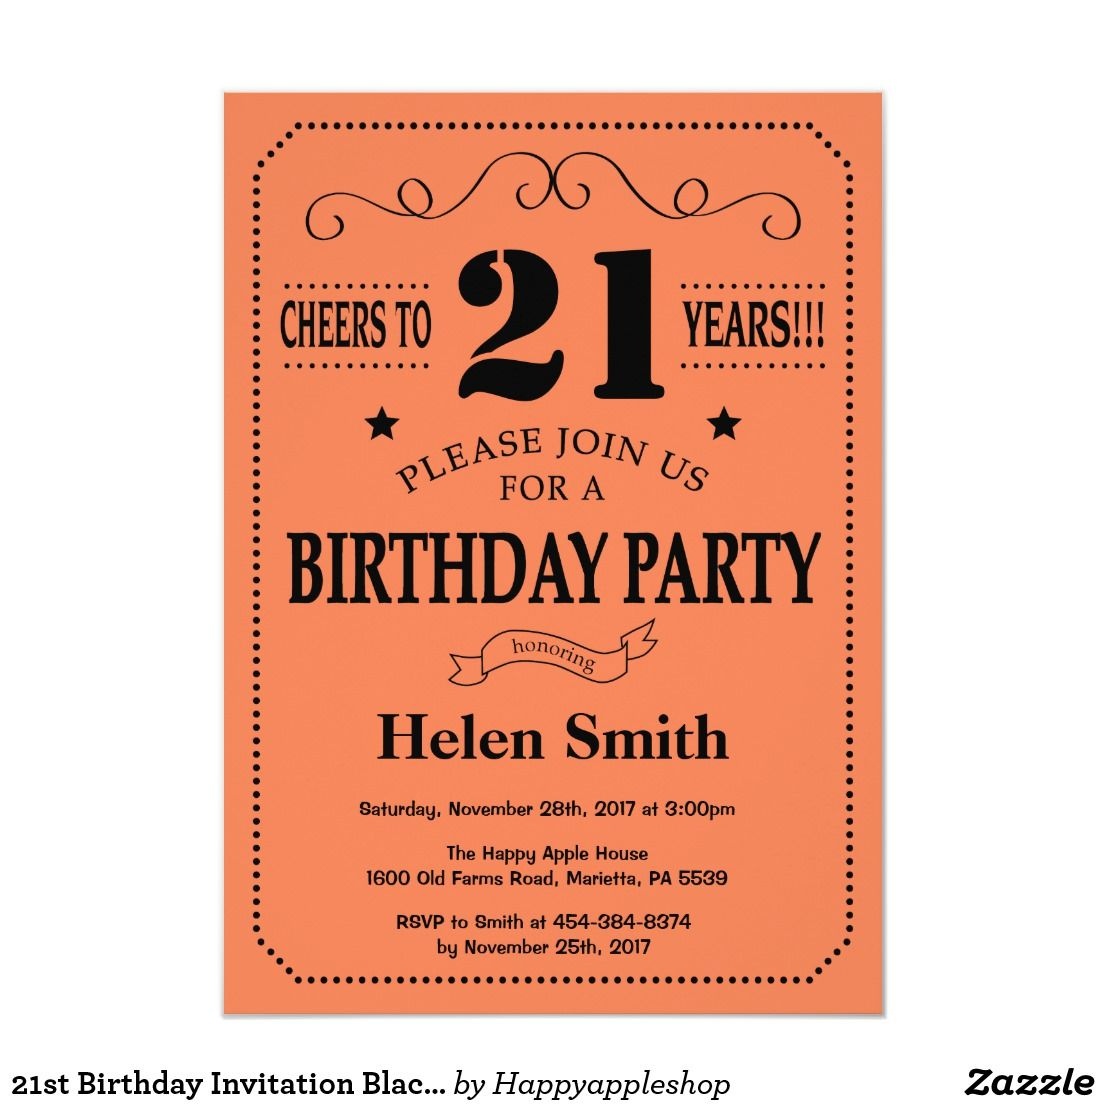 21st Birthday Invitation Black and Coral